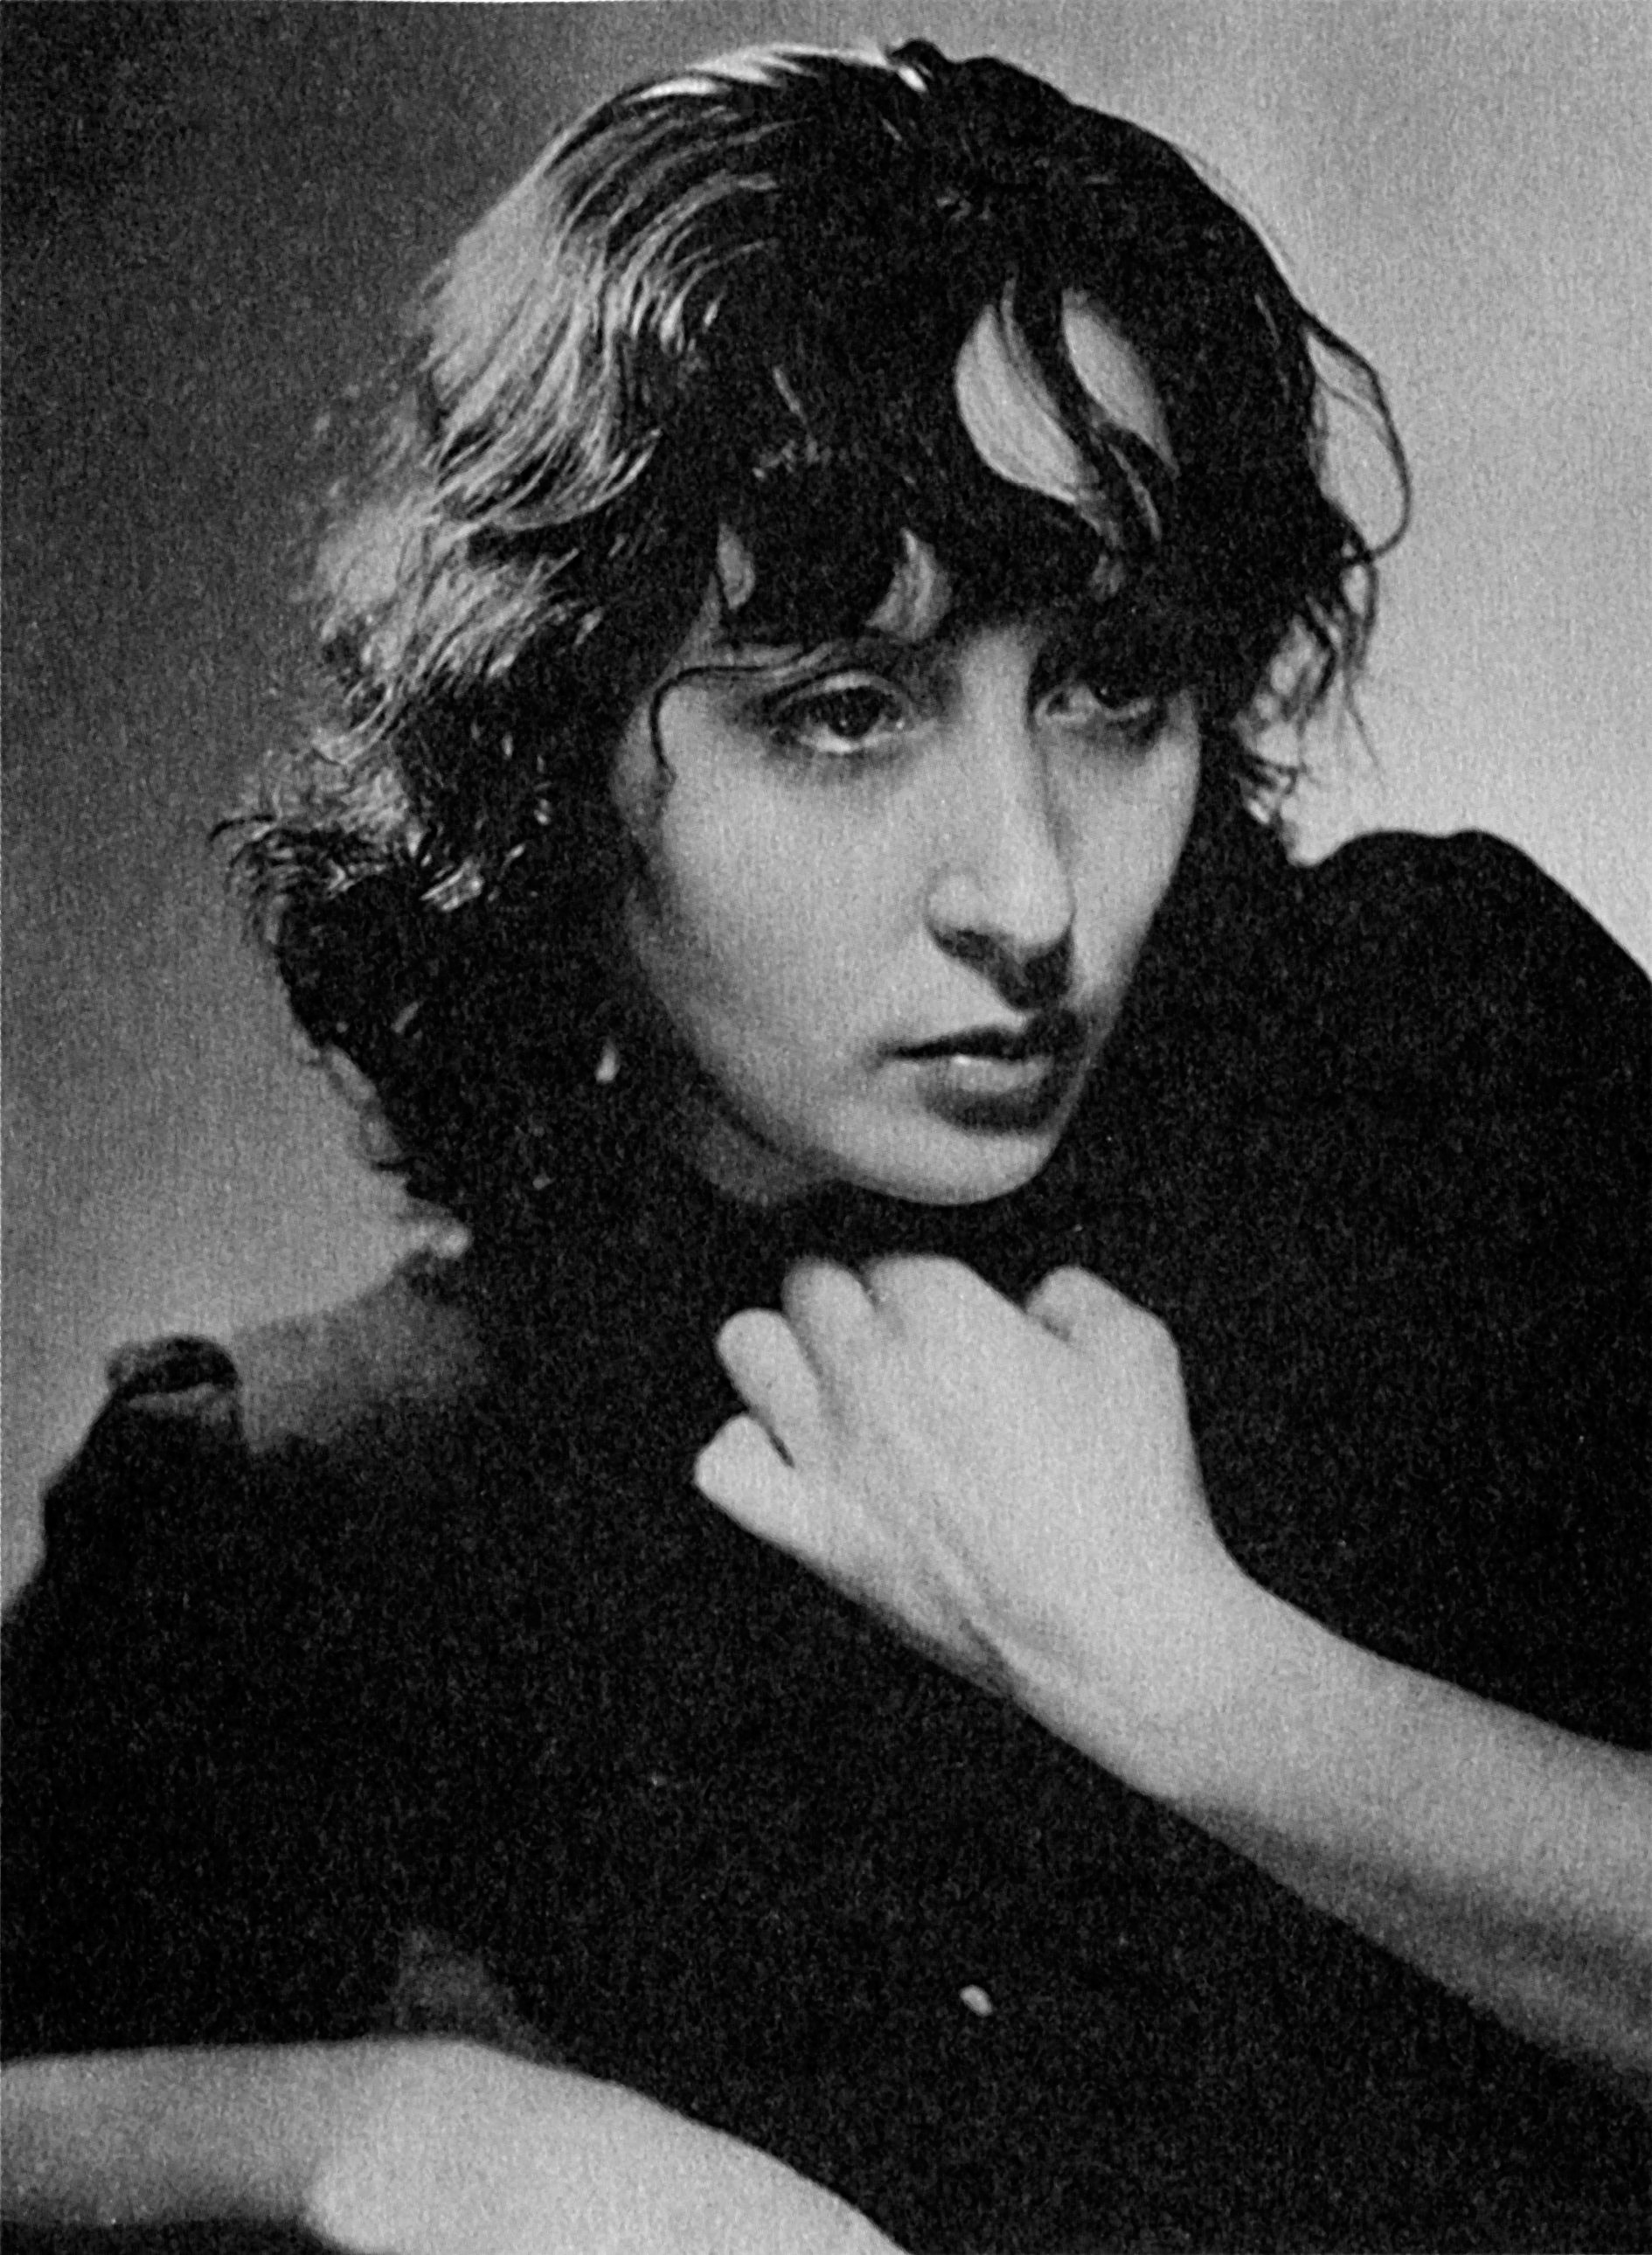 foto Clara Calamai (1909?998)